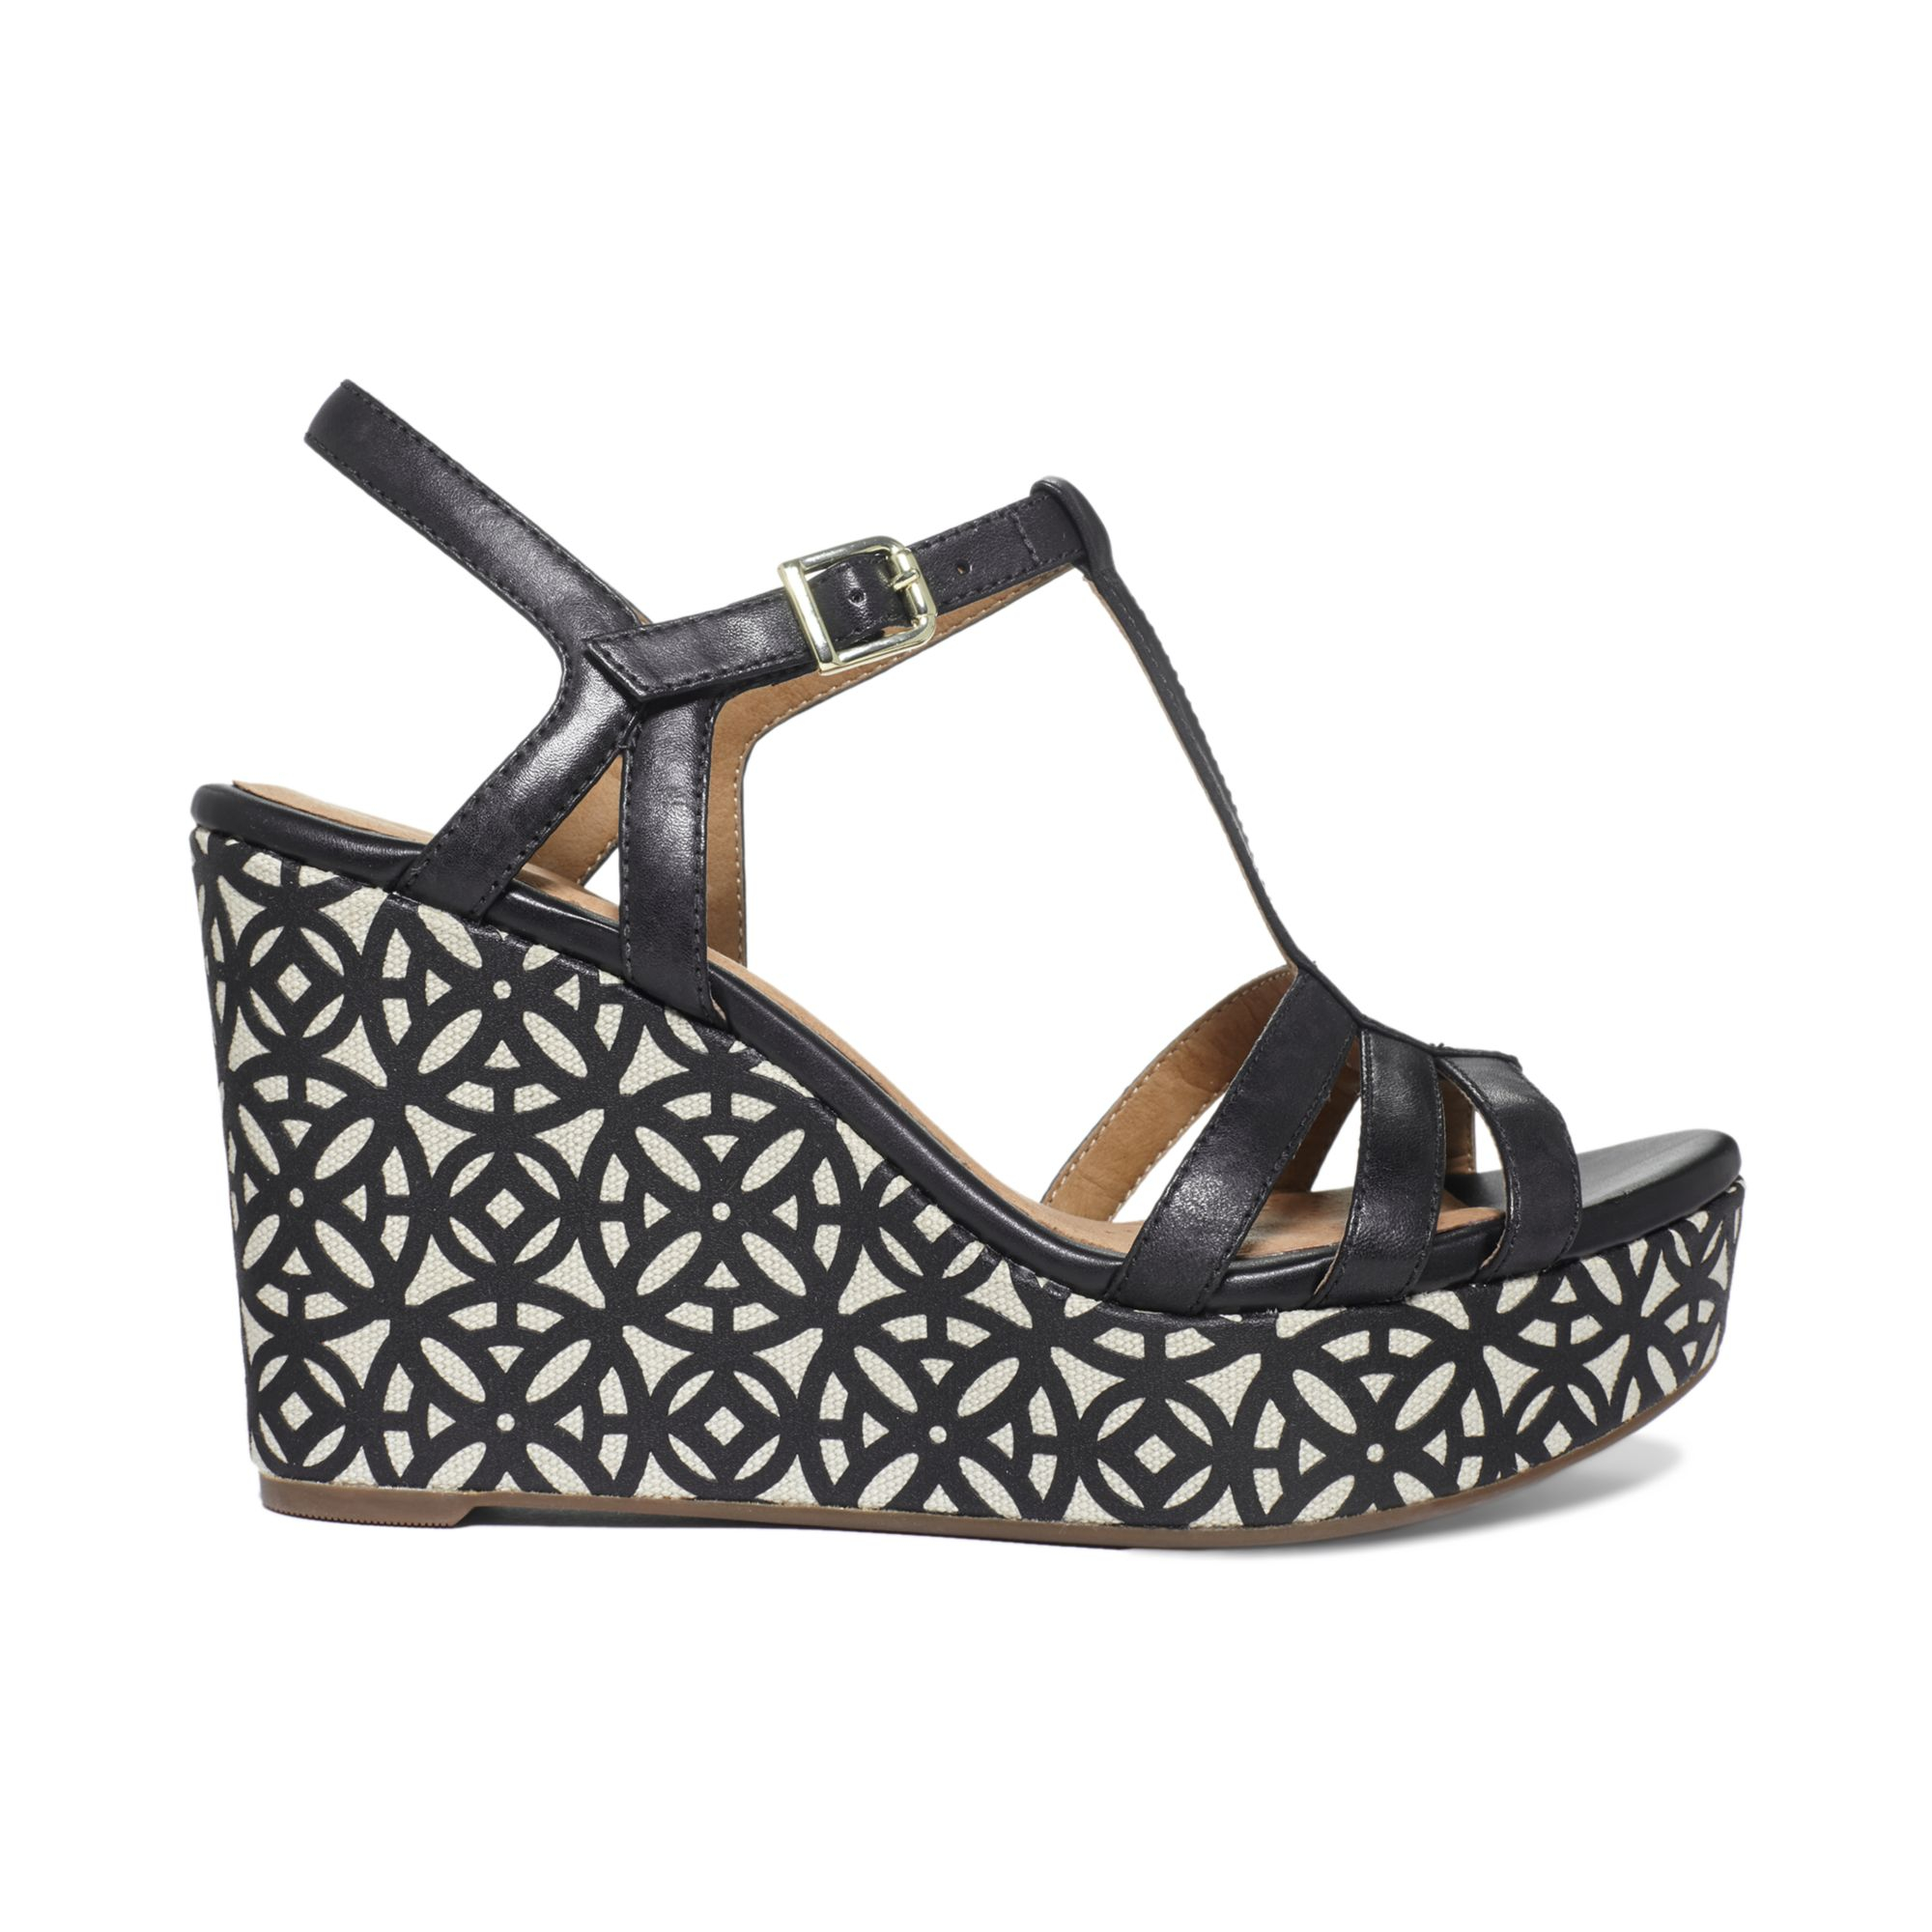 09c7921de52c Lyst - Clarks Artisan By Amelia Avery Platform Wedge Sandals in Black